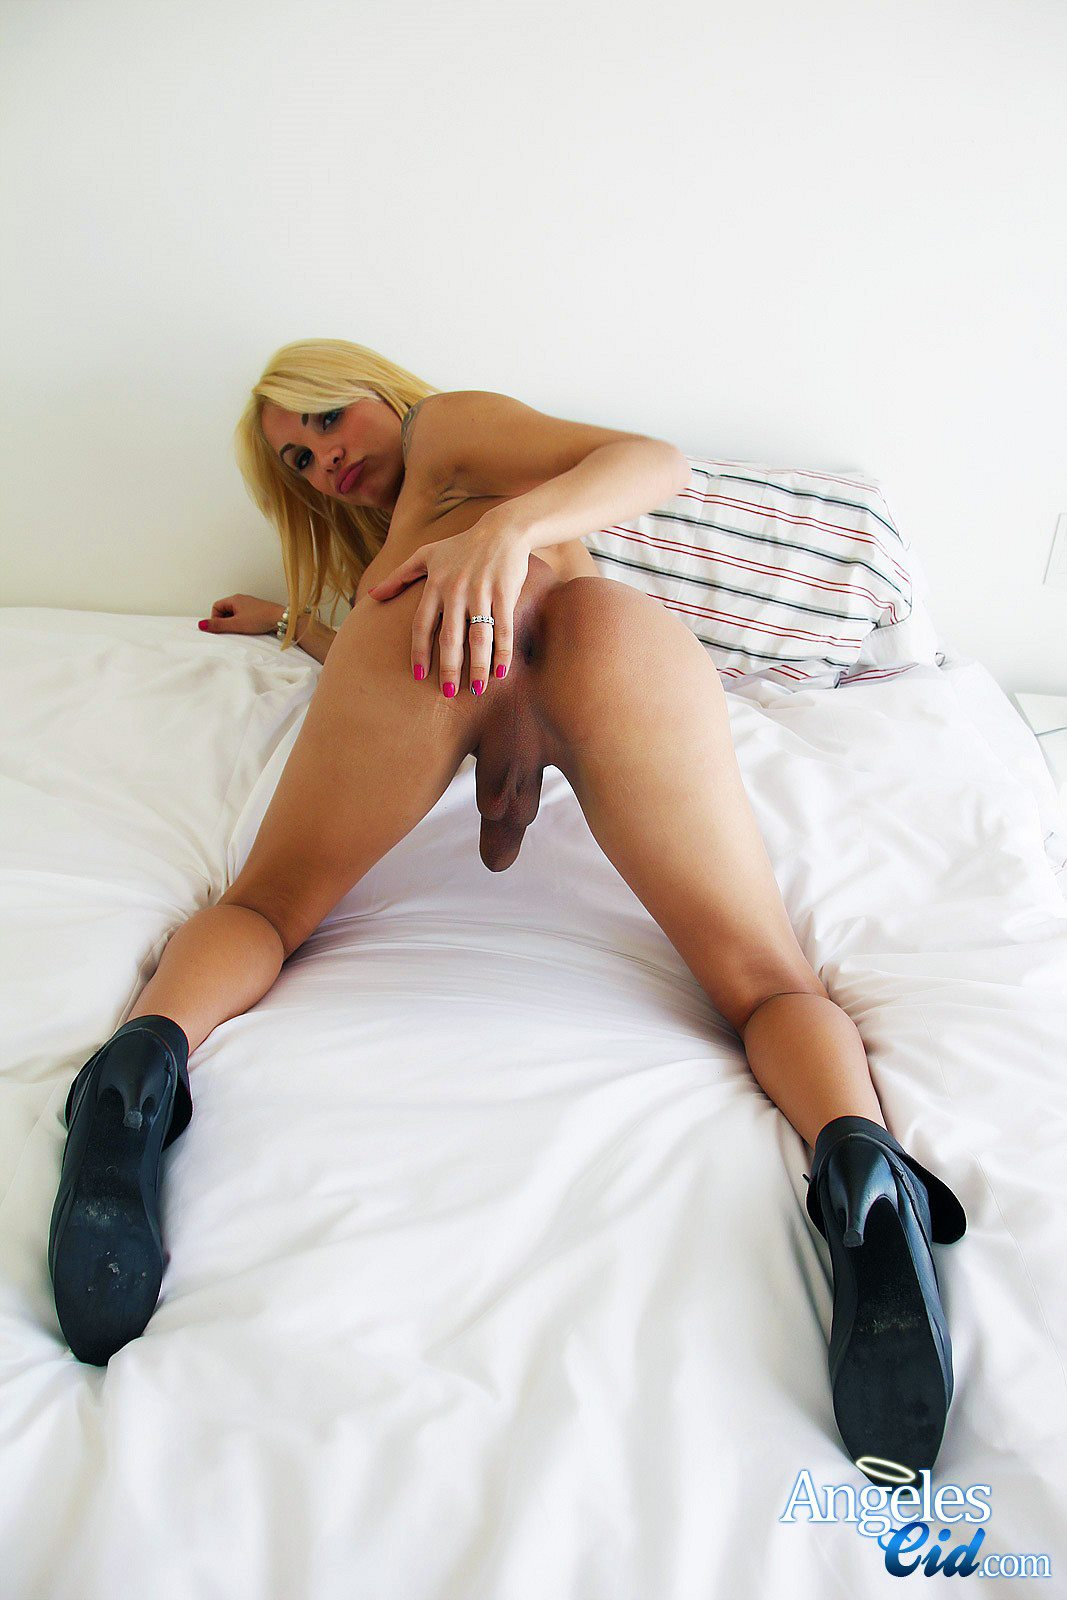 Spread trans girl ass